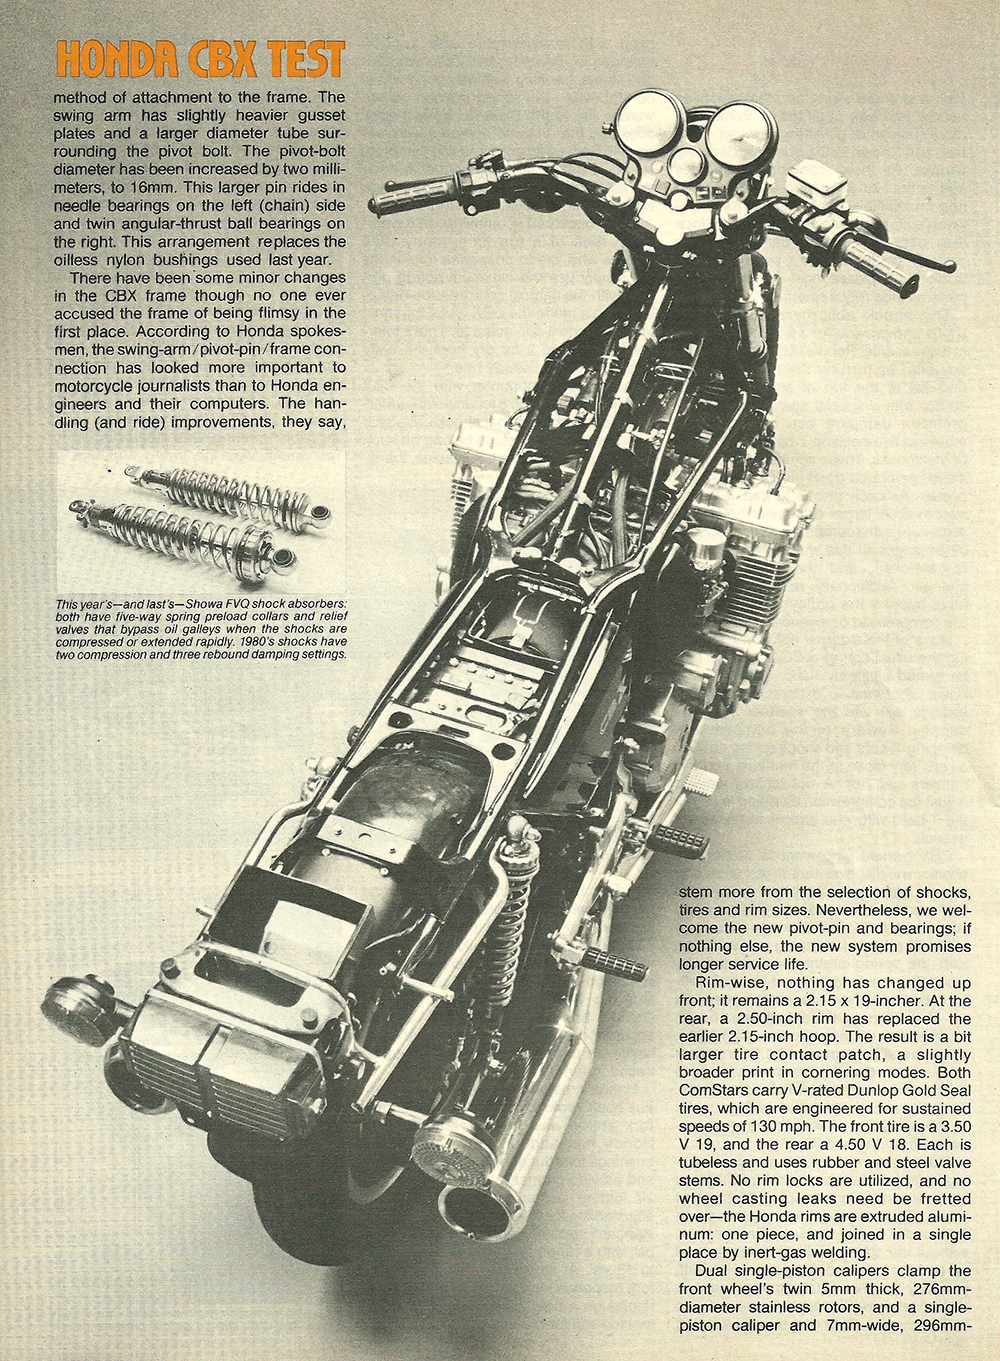 1979 Honda CBX road test 06.jpg